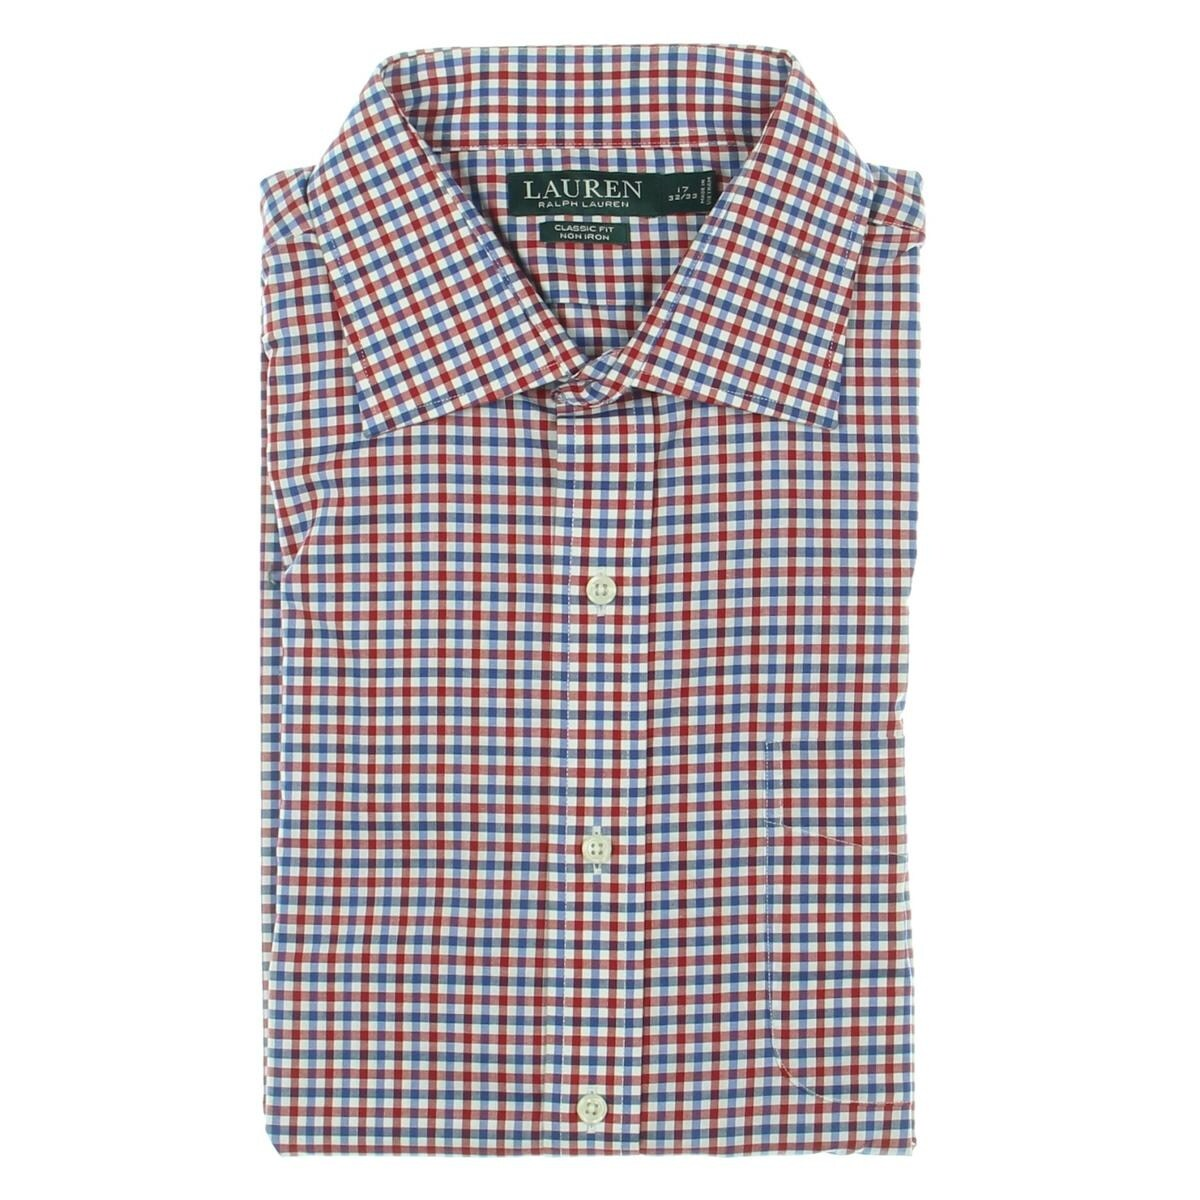 Talls Men/'s Banded Bottom Short Sleeve 3 Button Collar Shirt Tan//White 2XLT